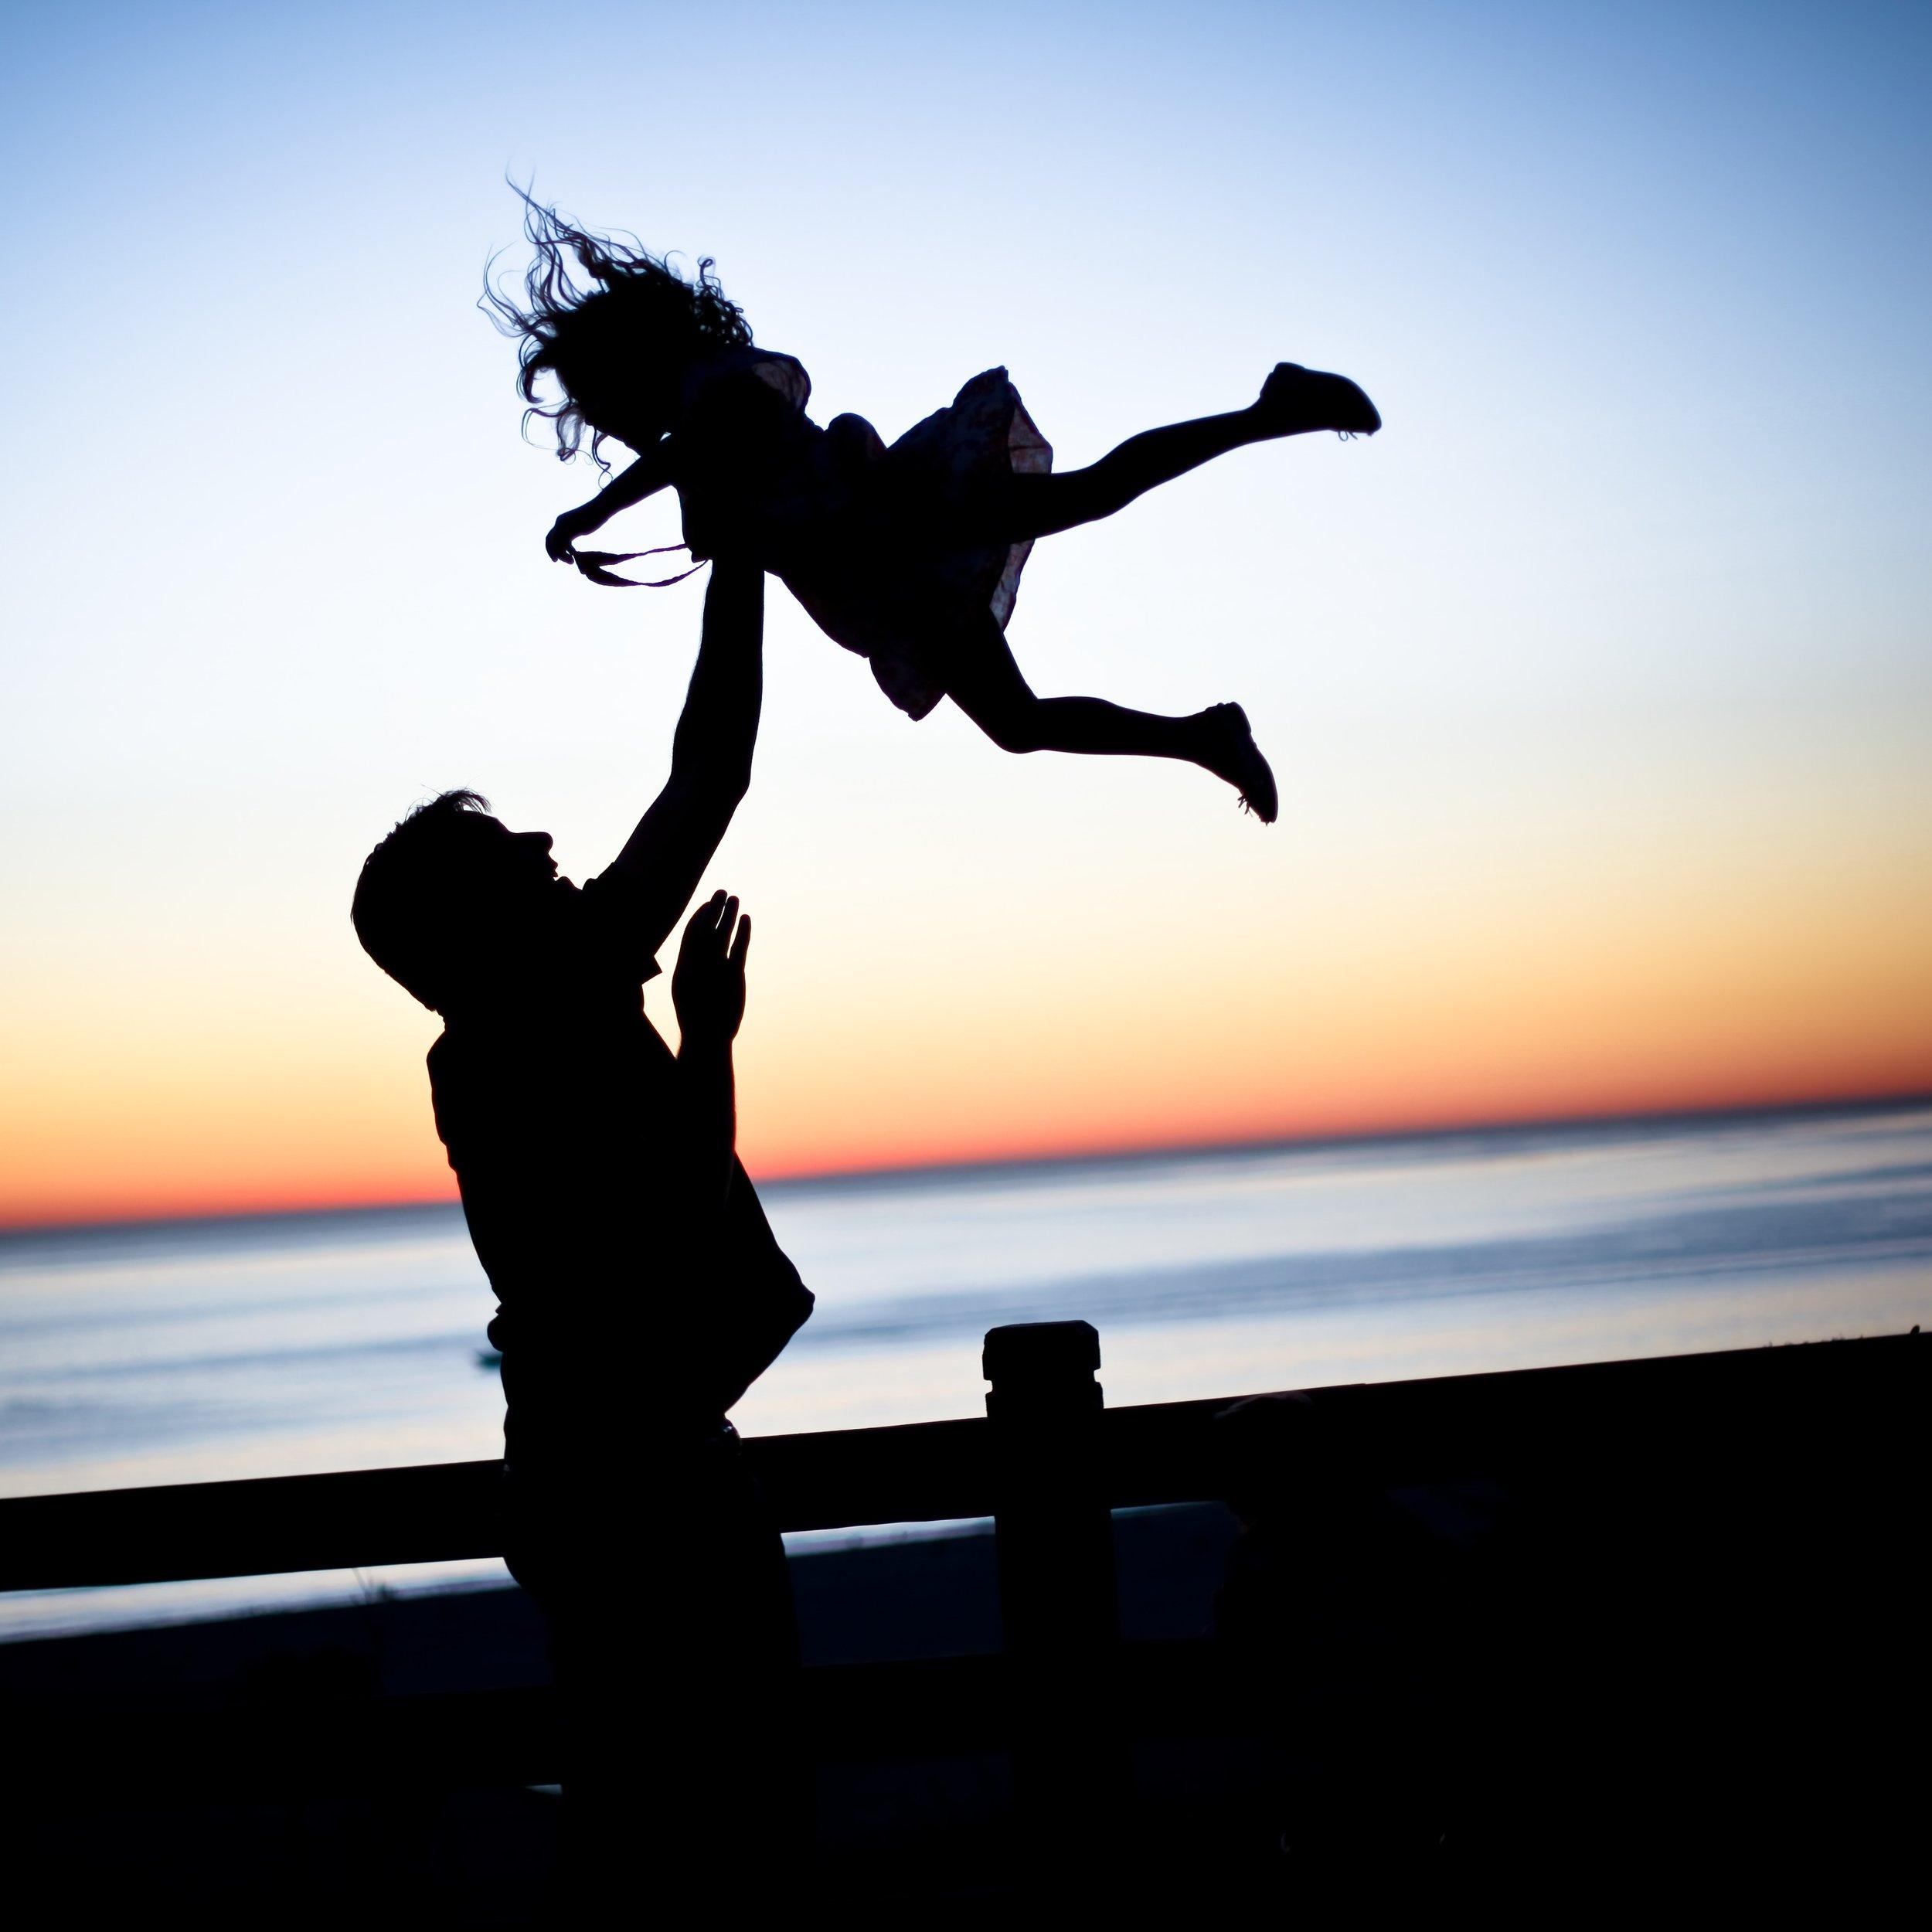 Daddy playing sillohette daughter.jpg